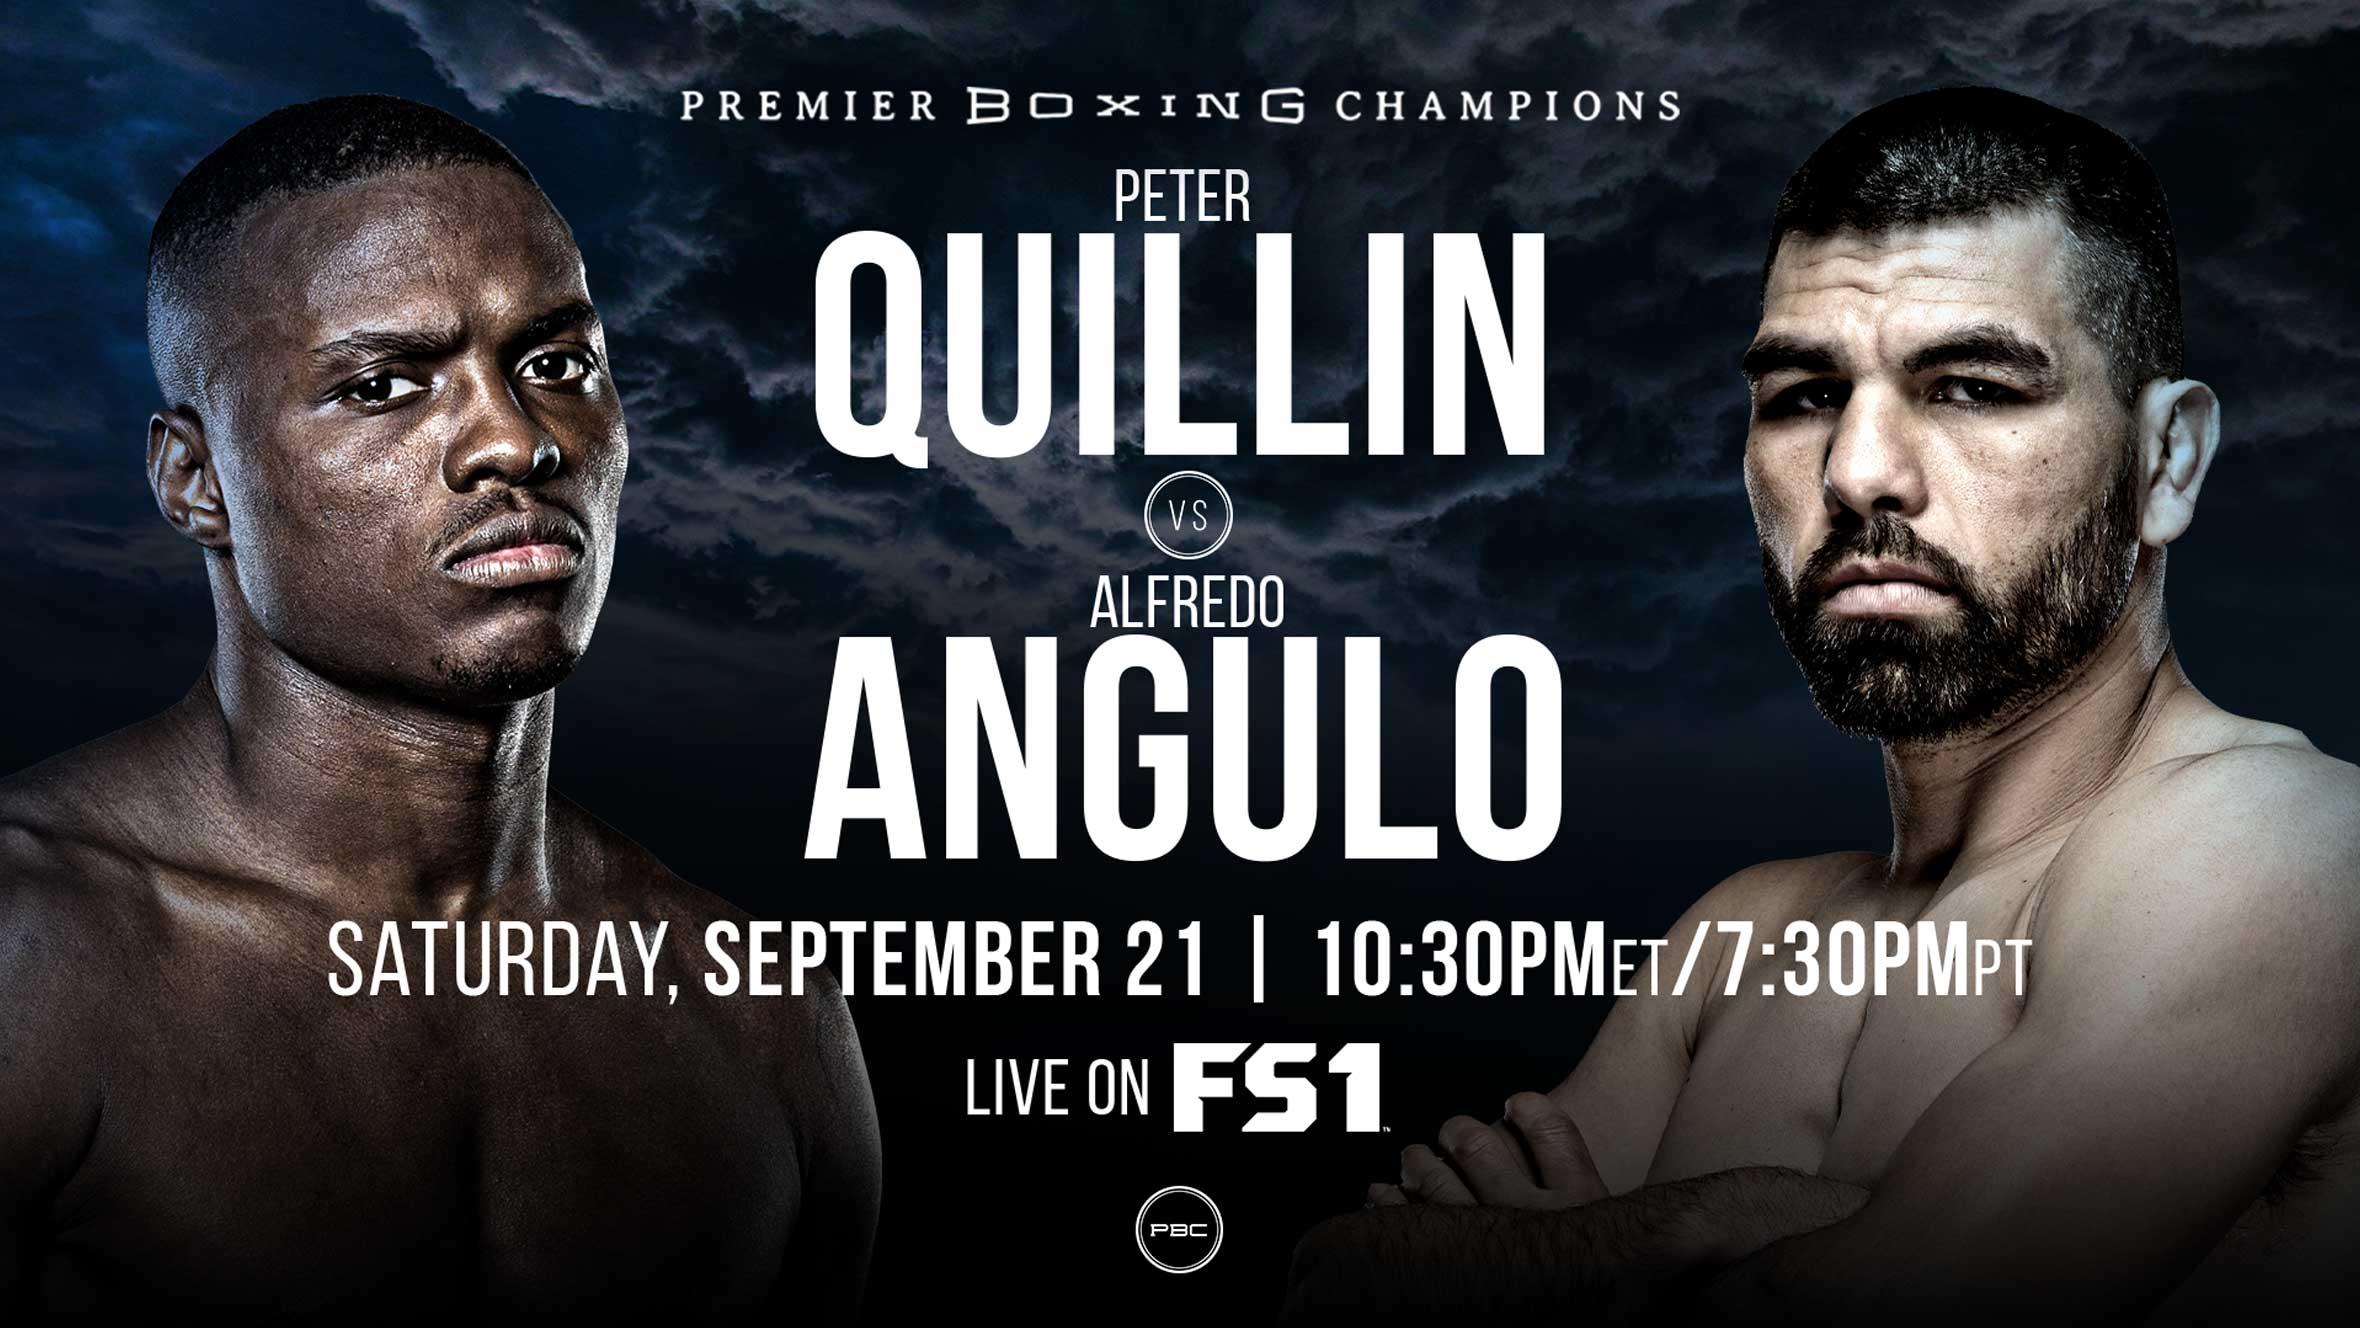 SiriusXM brings Premier Boxing Champions to satellite radio